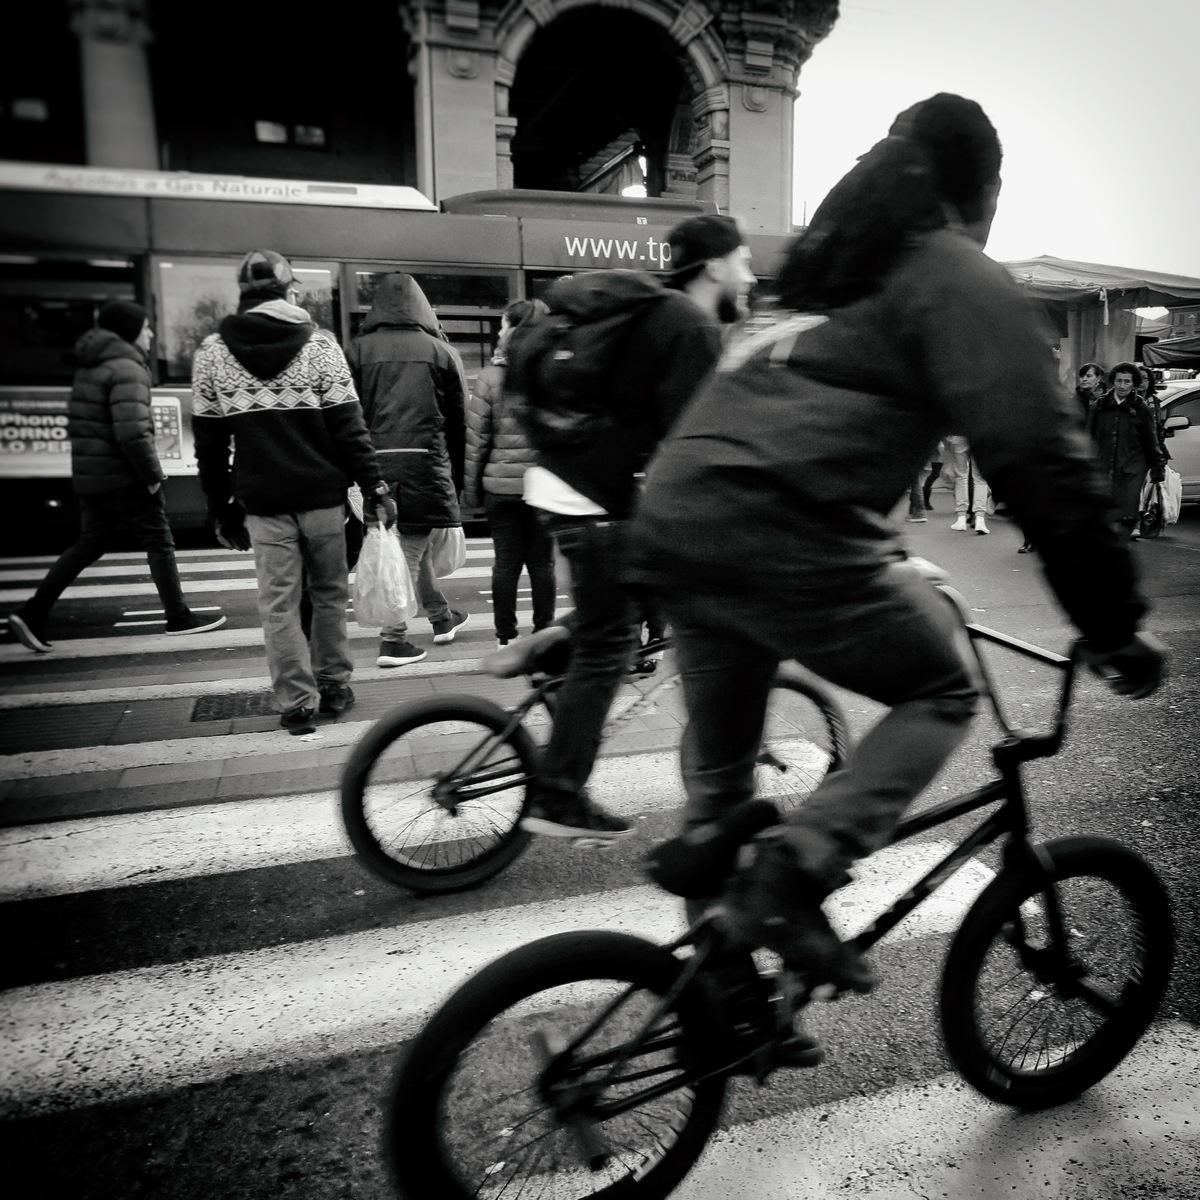 #BIKE2BMX 1 #Bologna IMG_8153 quad bike2 bn_resizeA by Viabici© Stefano Mascarucci (Renzi)